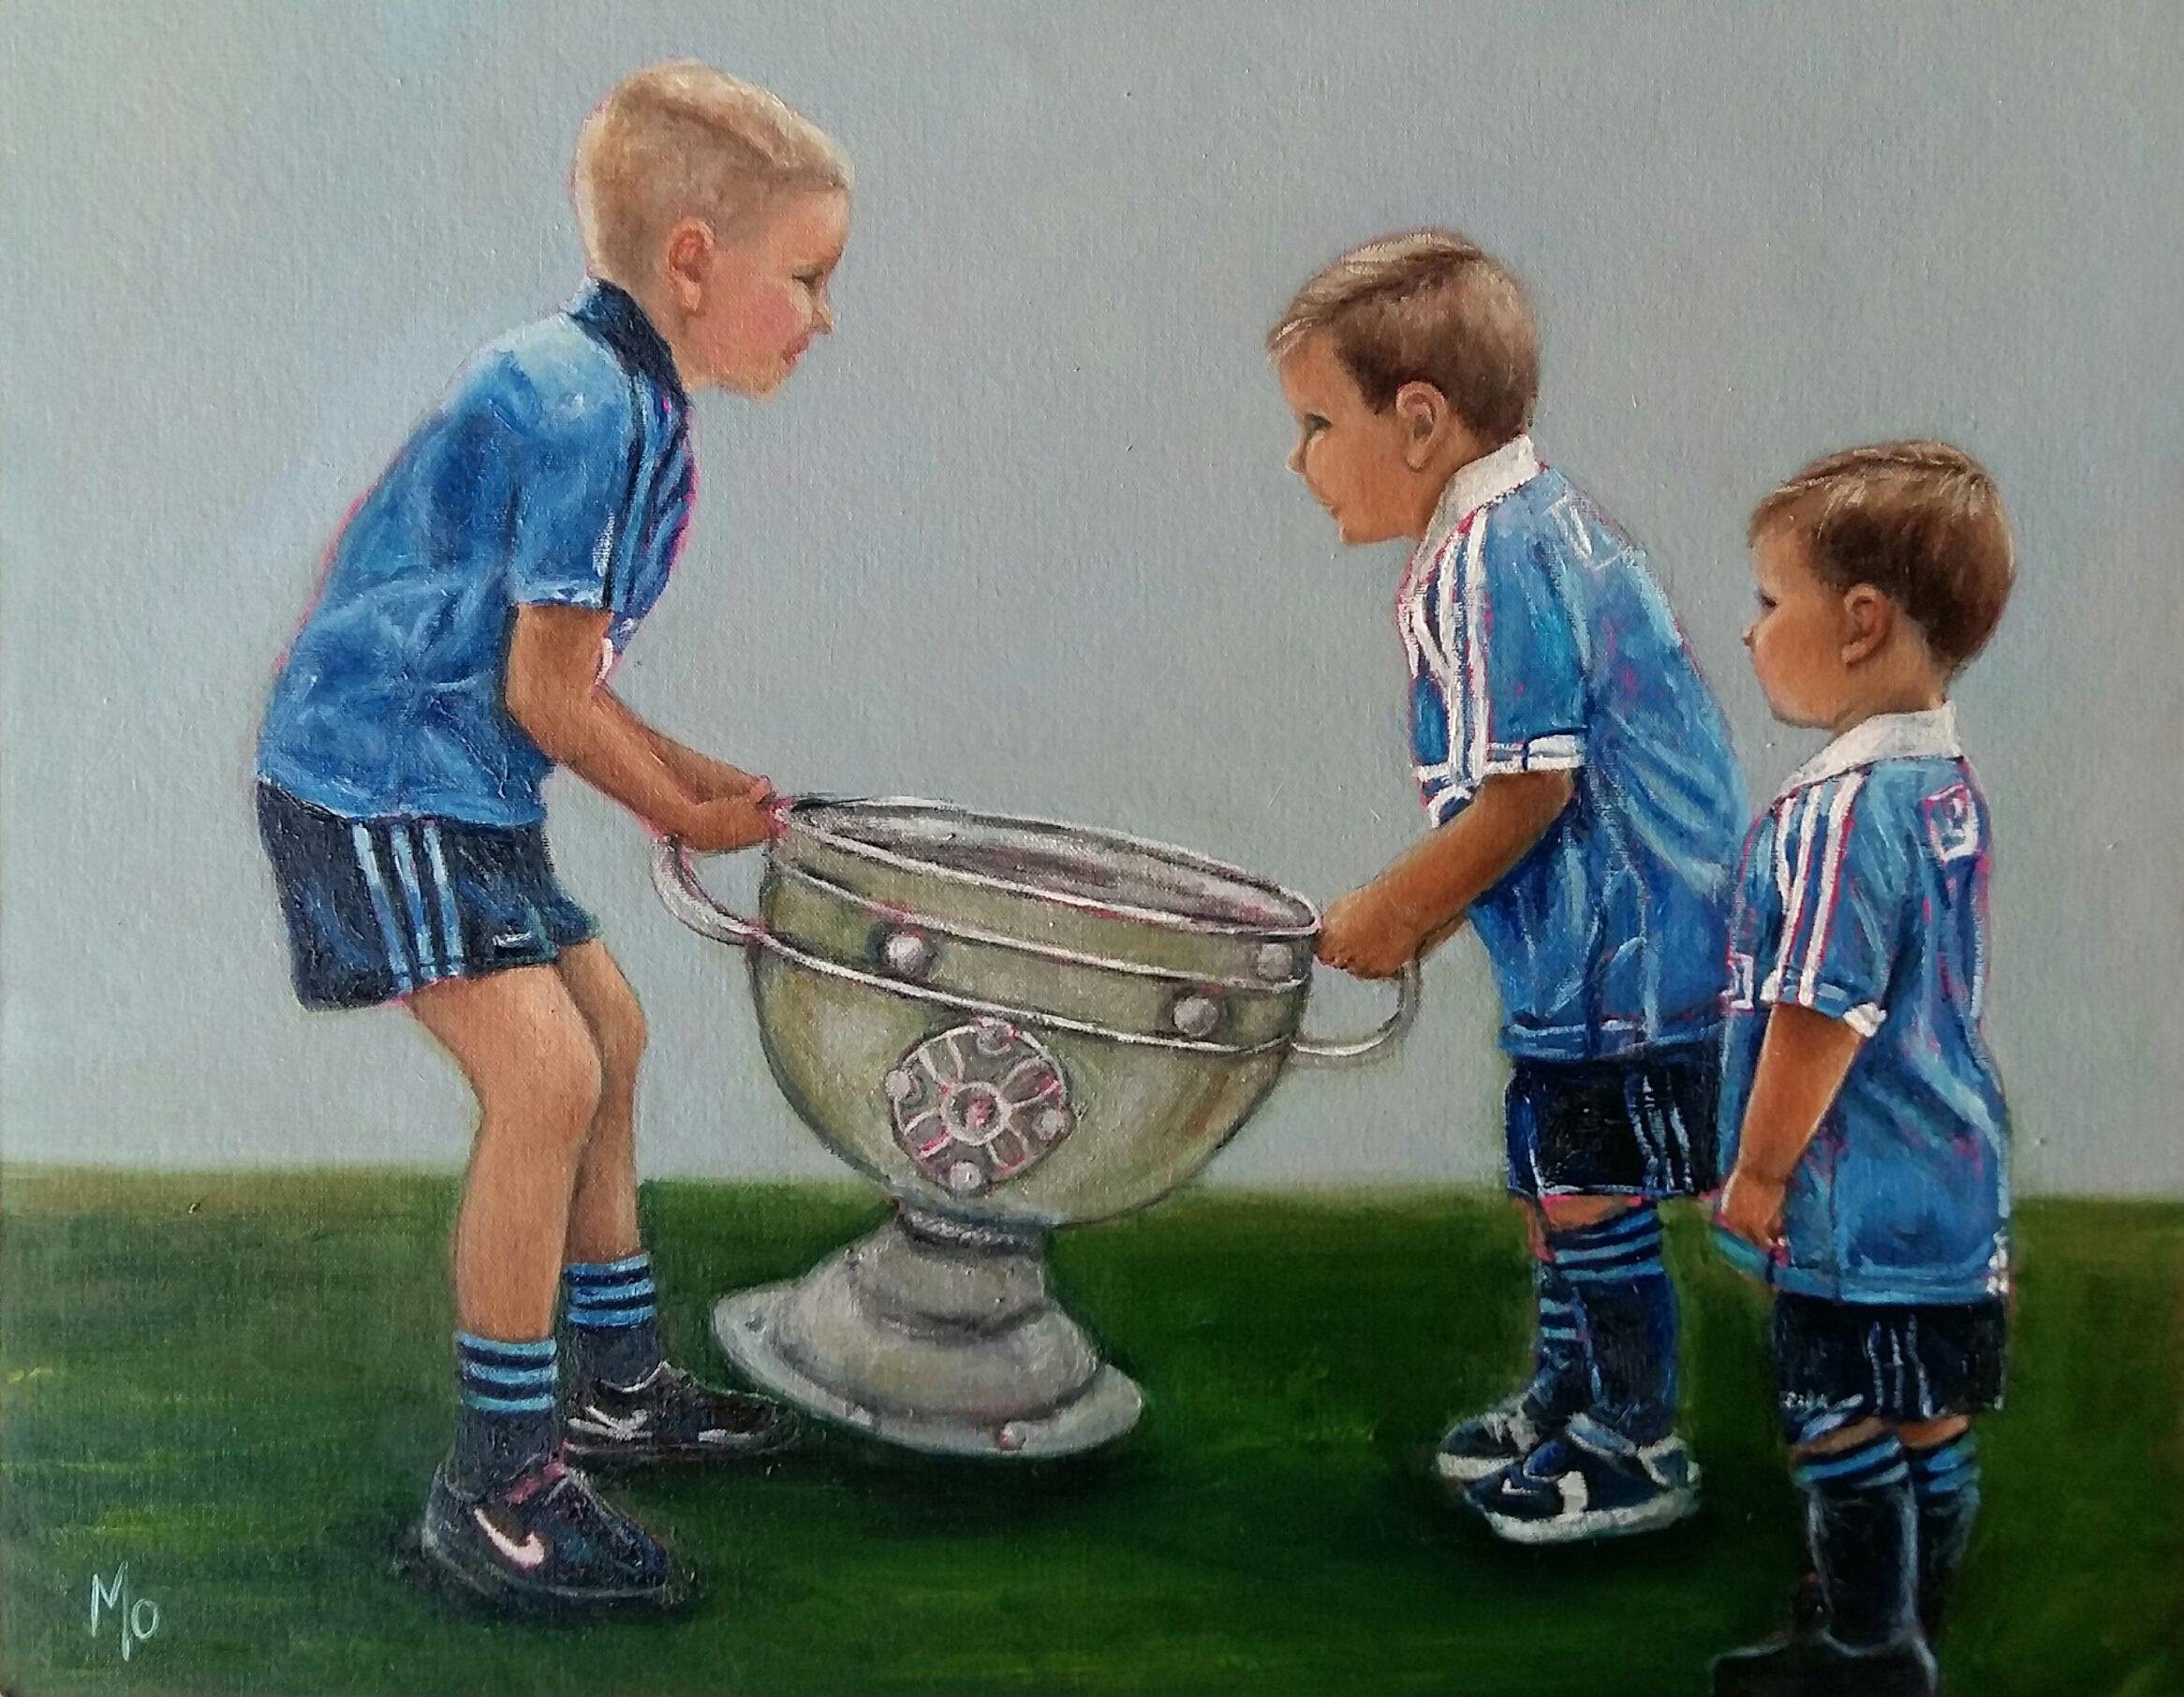 Three boys lifting the Sam Maguire wearing dublin GAA jerseys